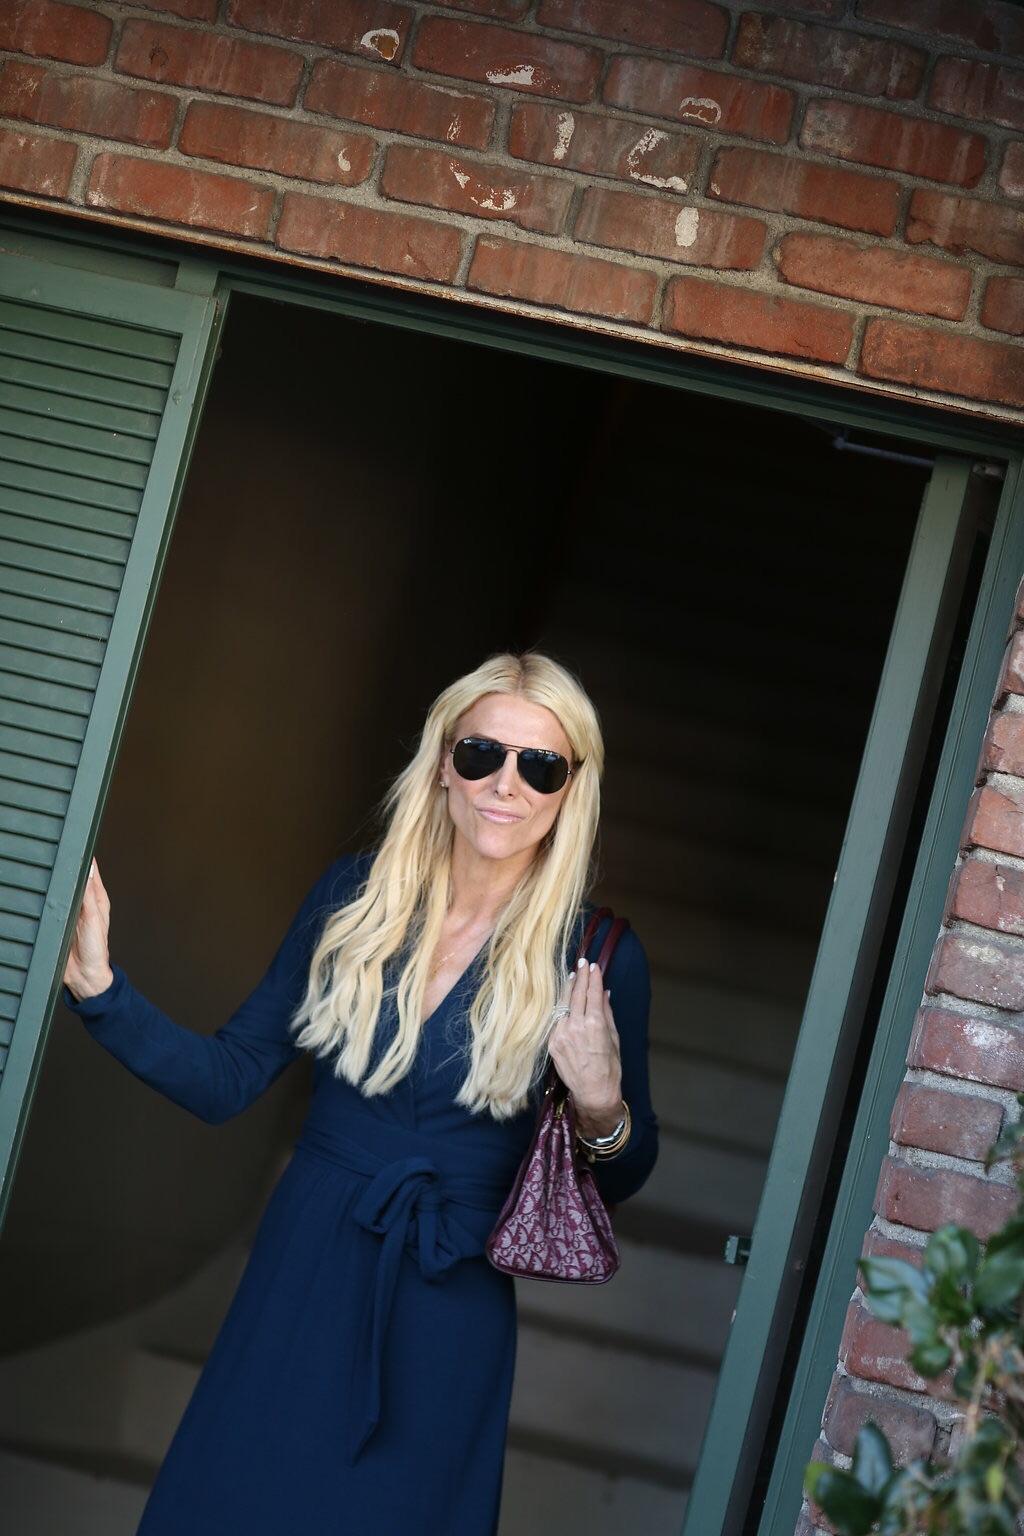 Dress: CAbi (old, but similar  here ) Sunglasses: ( Rayban ) Handbag: Dior (old) Shoes: ( Kate Spade )